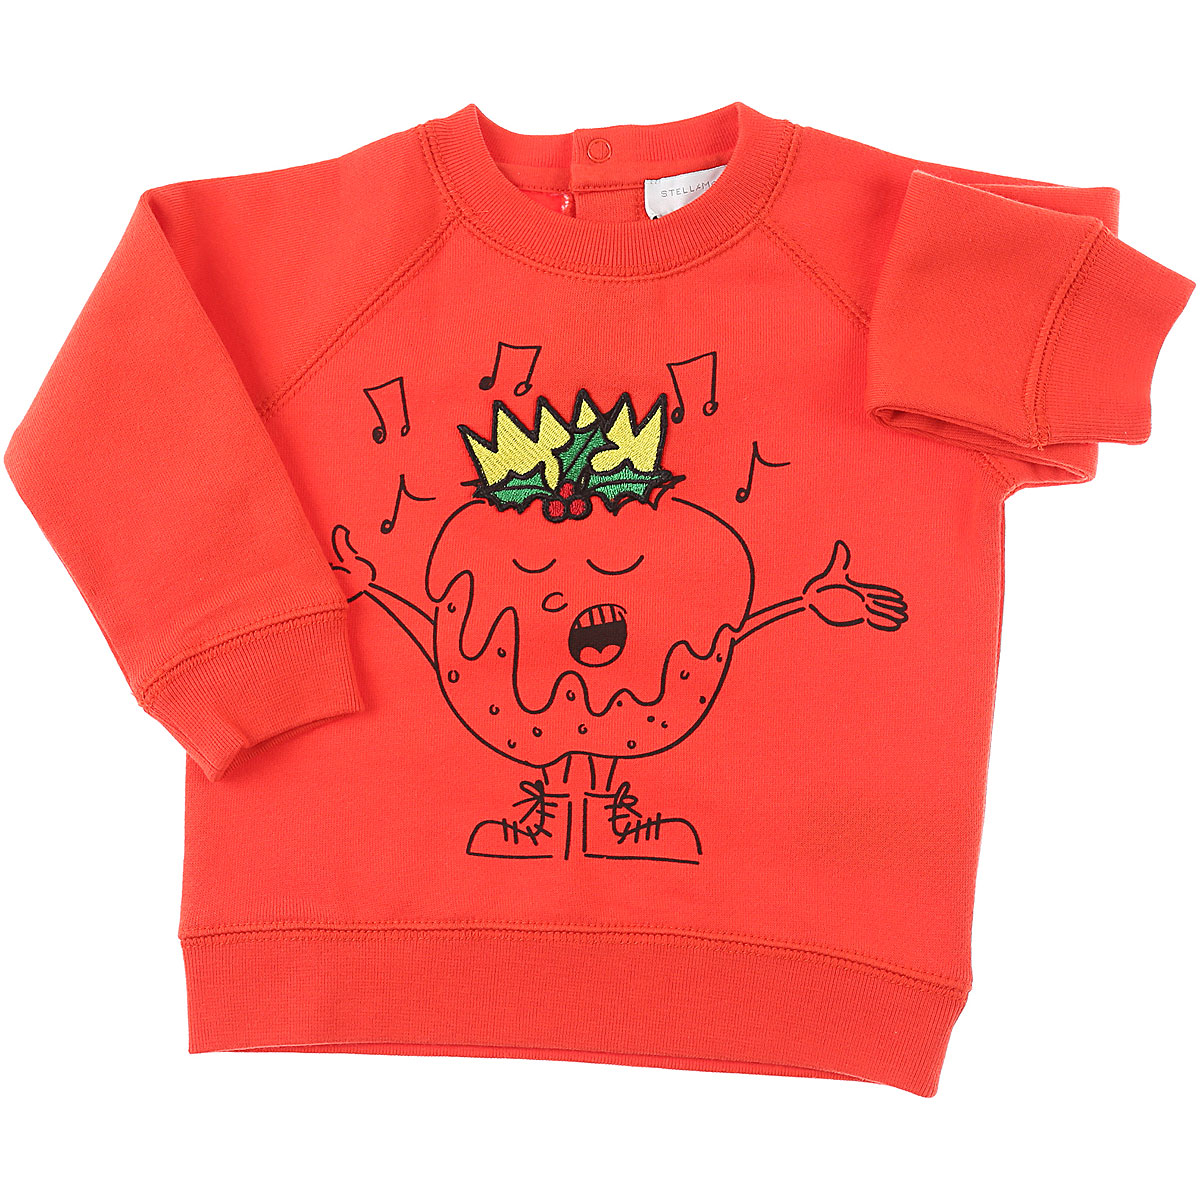 Stella McCartney Baby Sweatshirts & Hoodies for Boys On Sale, Orange Red, Cotton, 2019, 12 M 18M 2Y 3Y